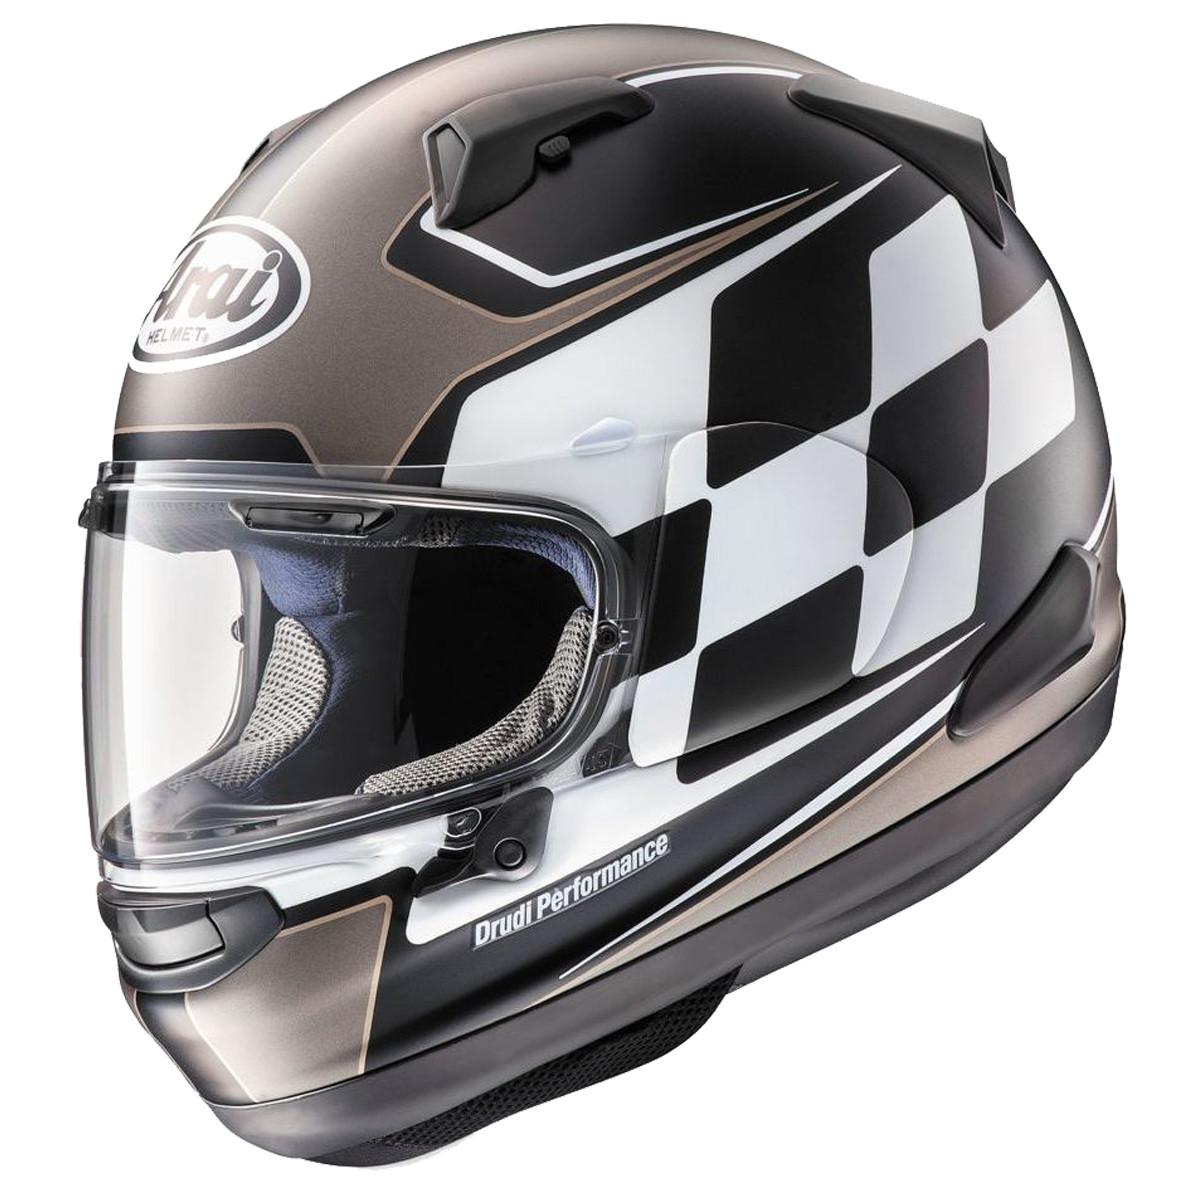 48592a6e Arai Signet-X Finish Helmet - Motorcycle House